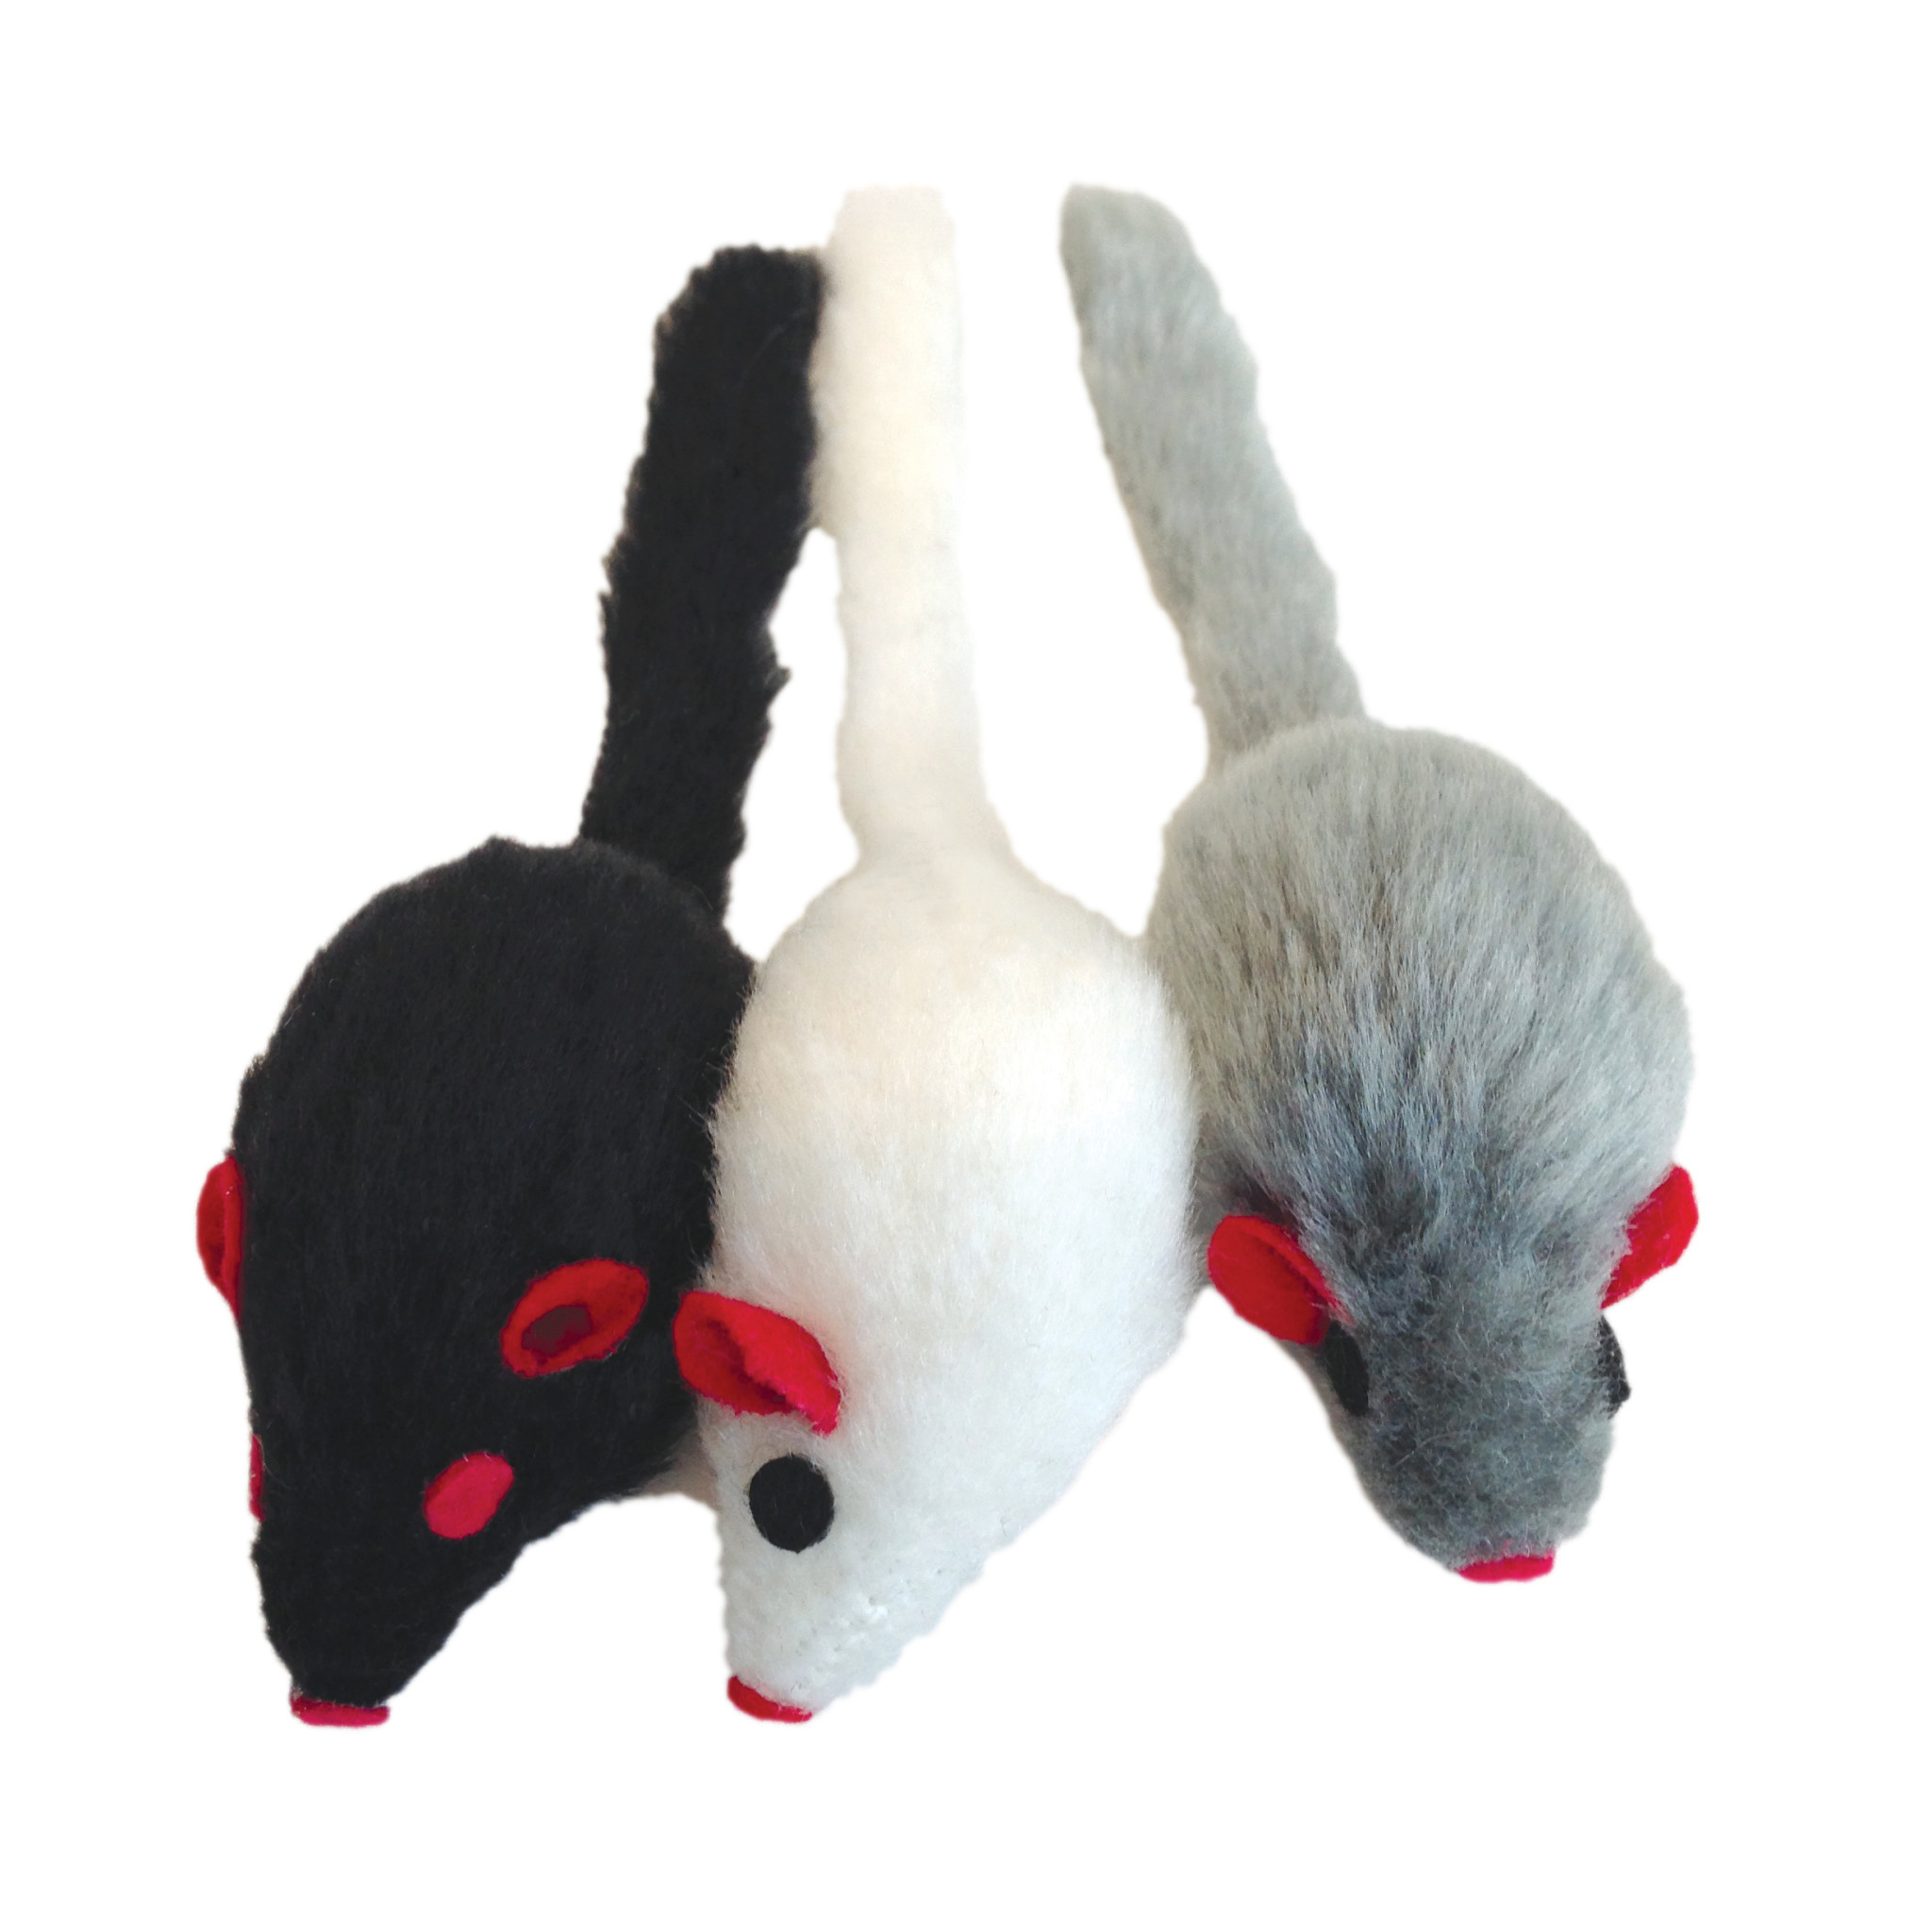 CL Furry Frolics, Catnip Furry Mice 3pck-2